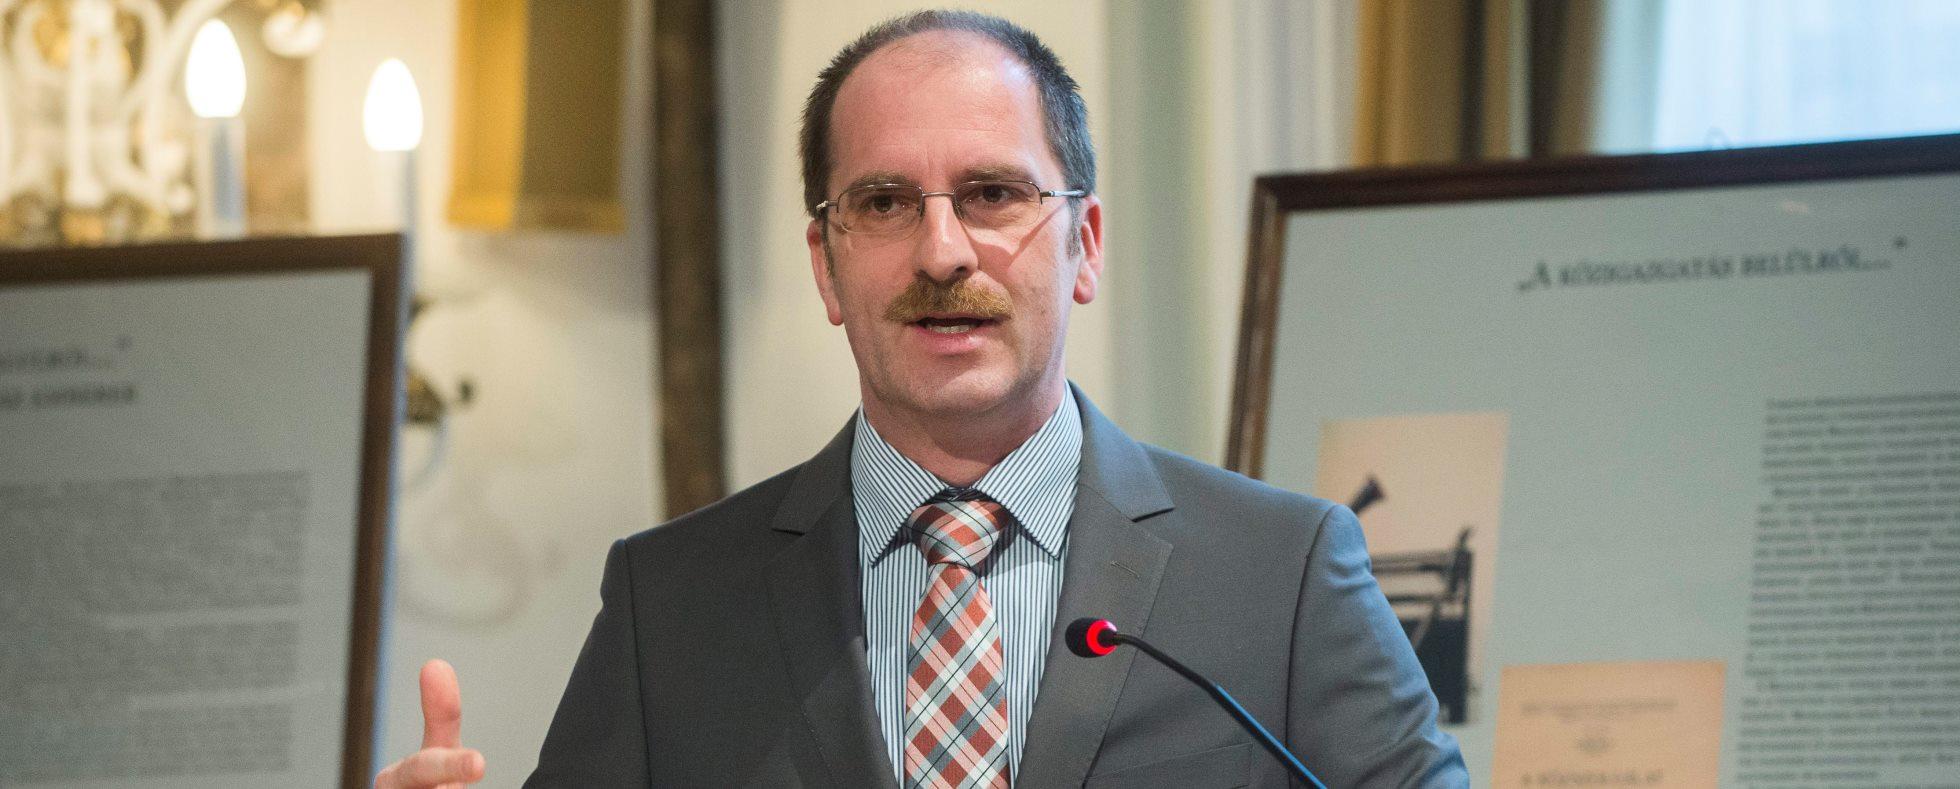 Lemondott Patyi András, az NKE rektora